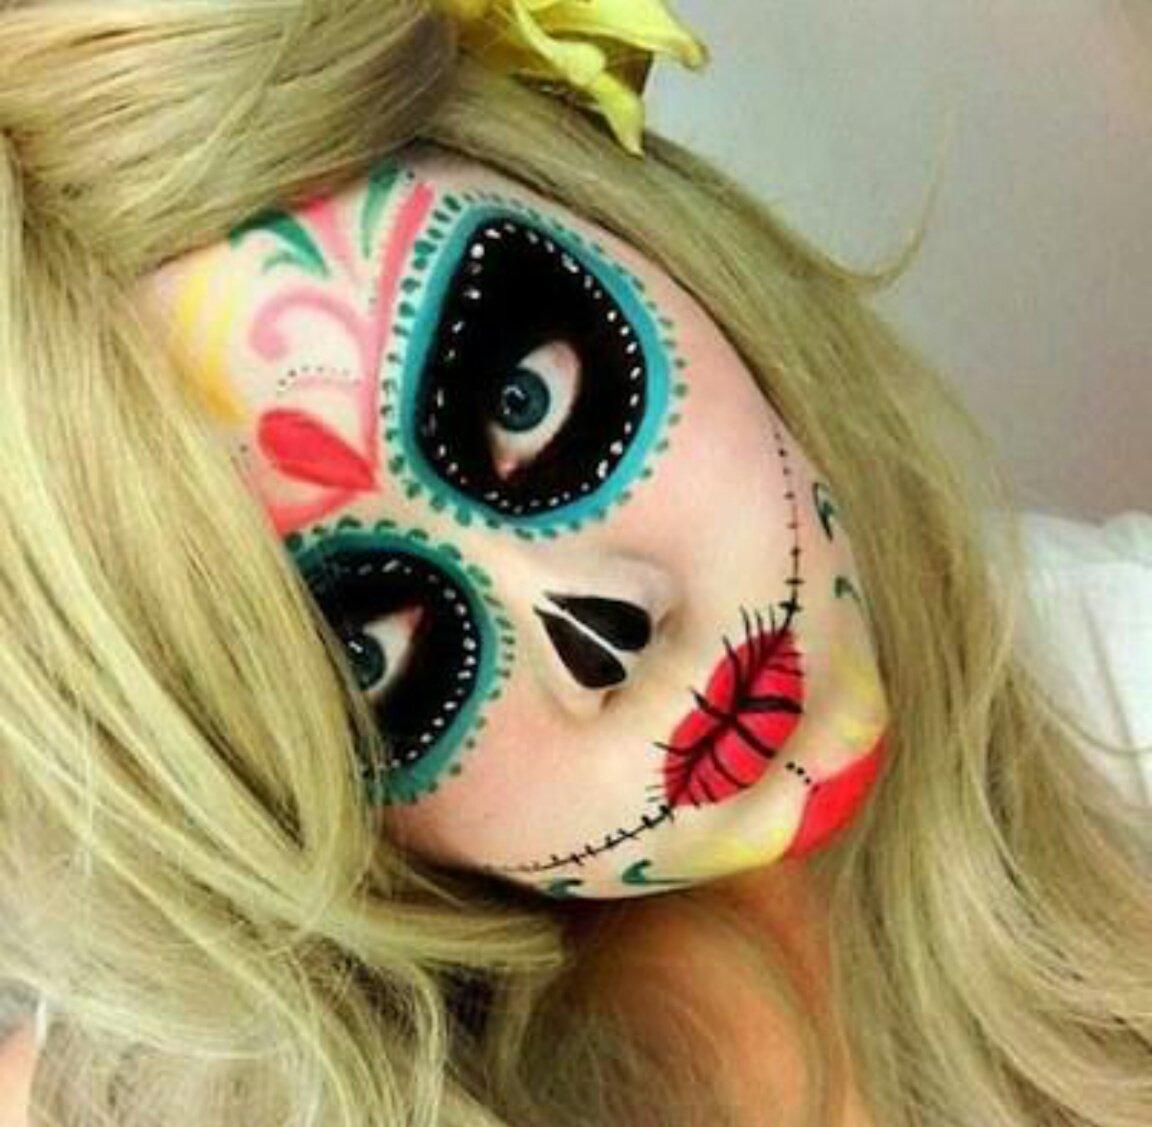 Спасибо подружка, картинки для лица на хэллоуин